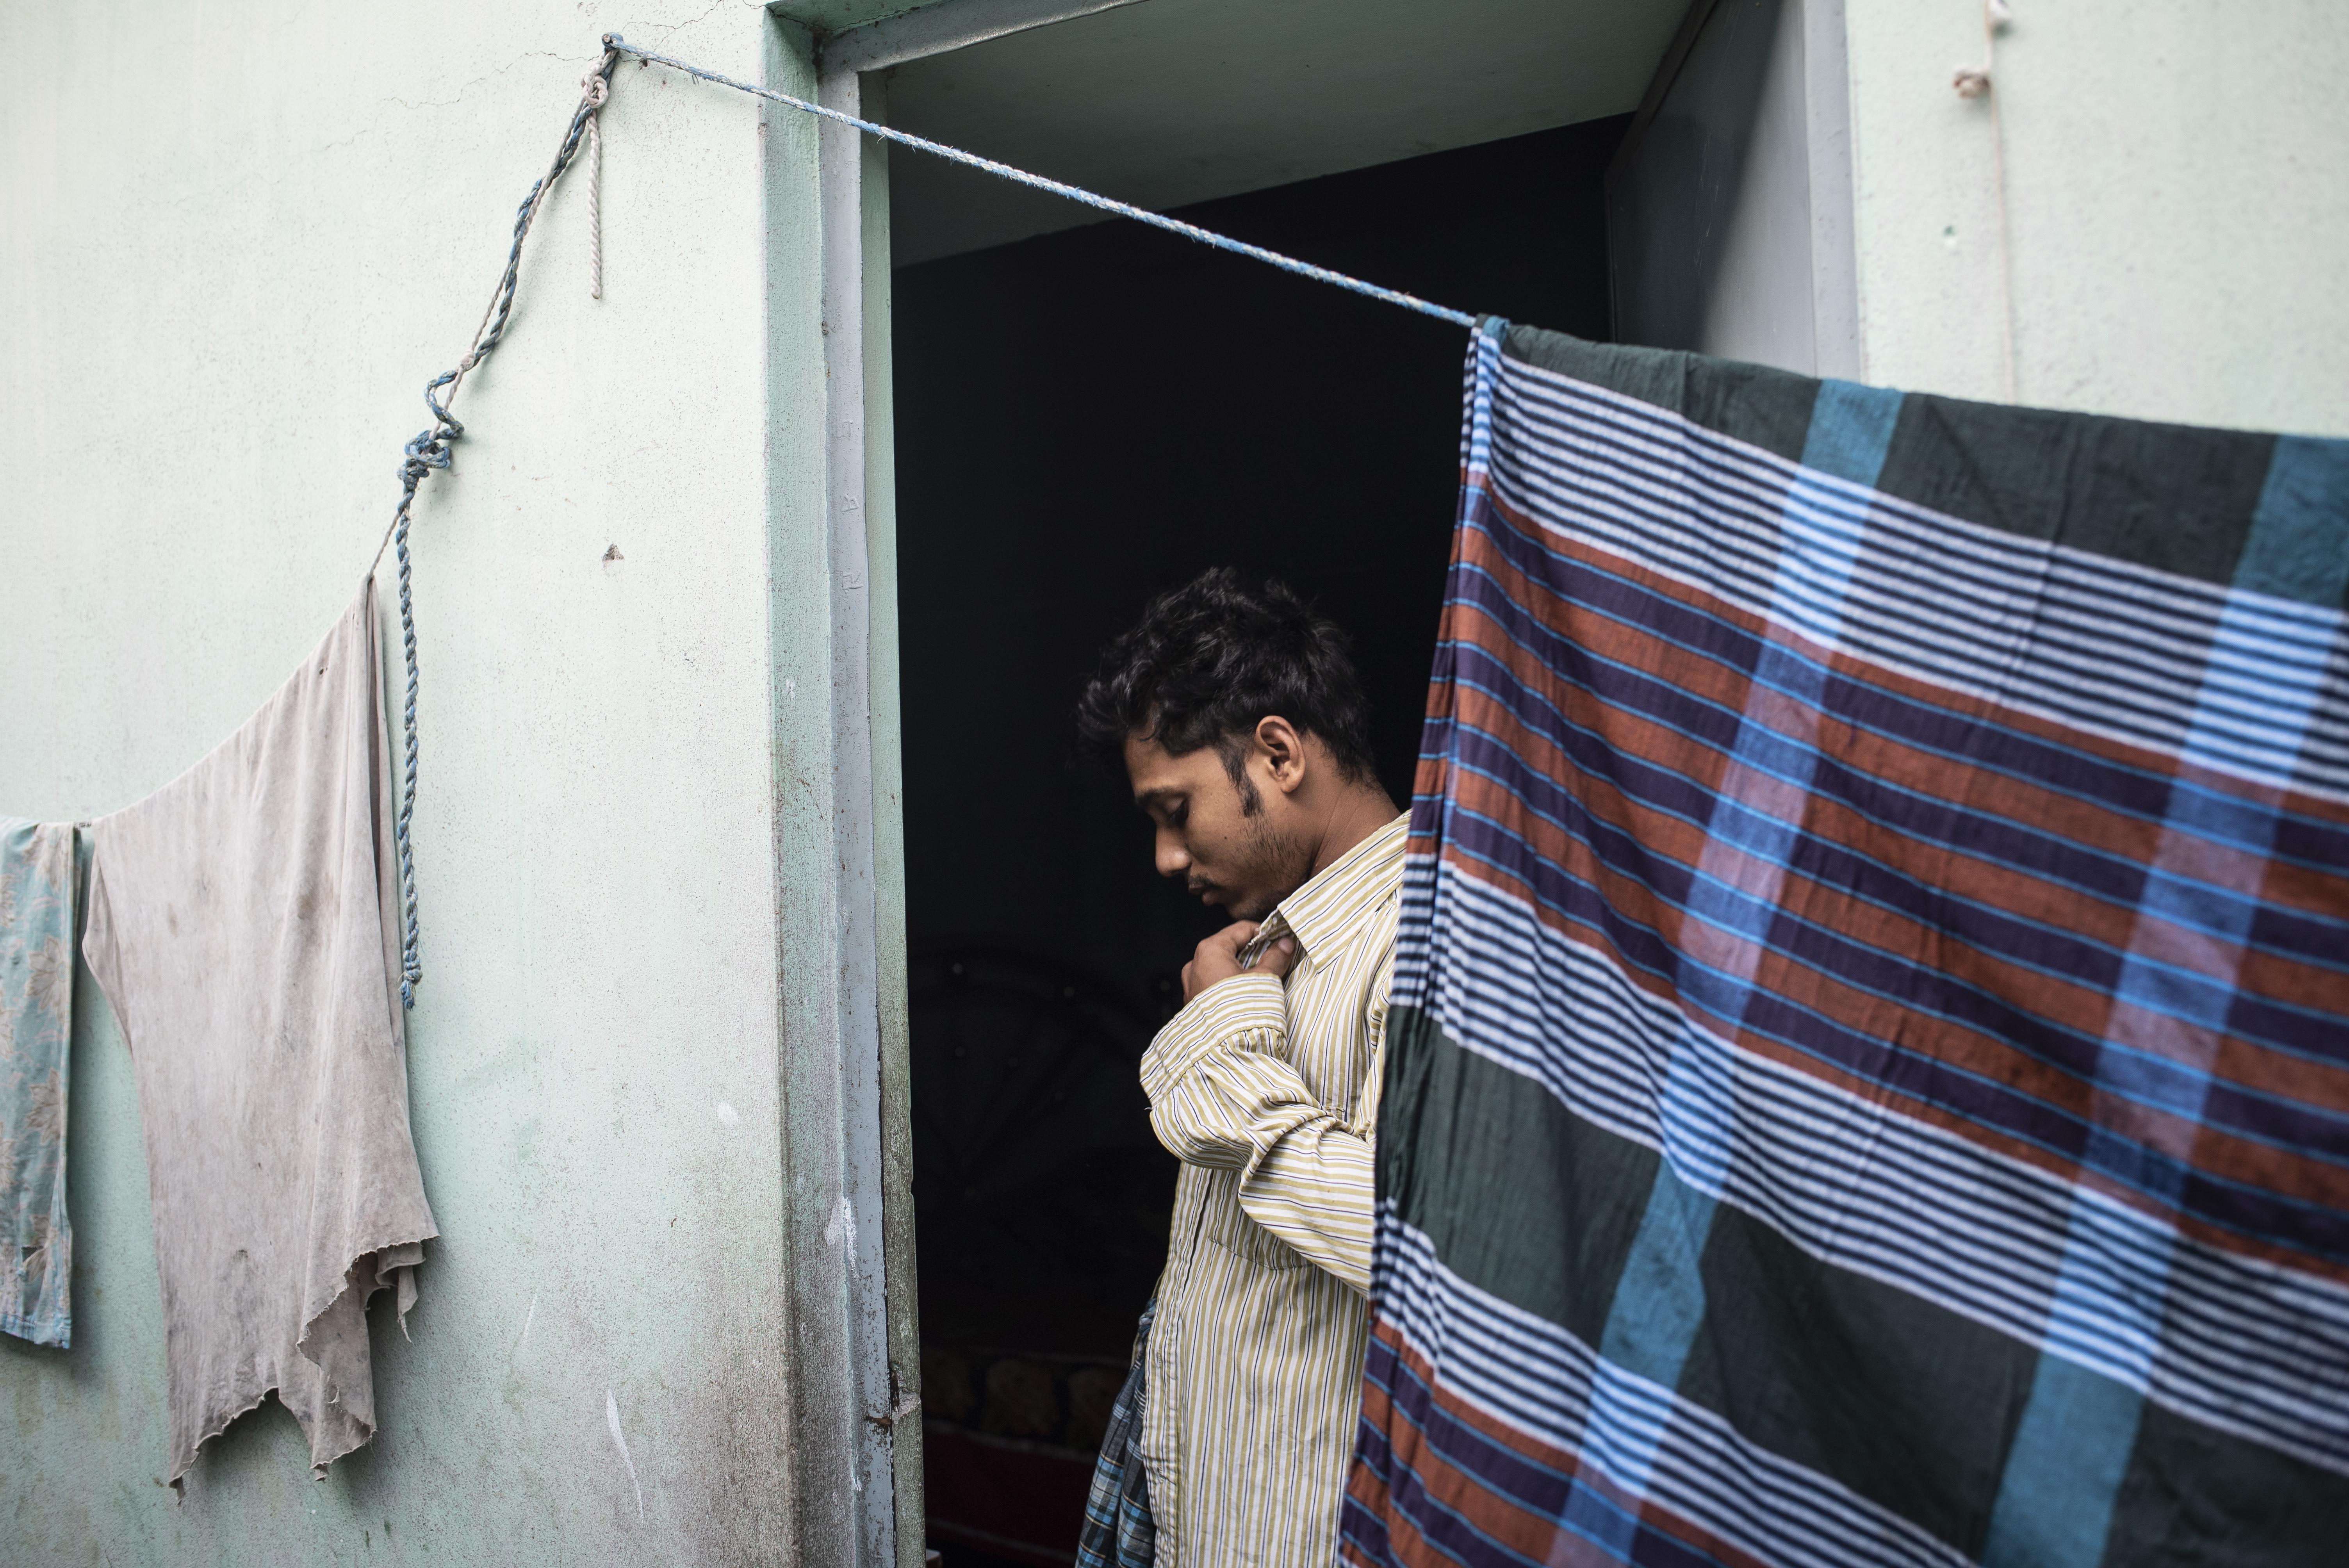 Rubel i Dhaka, Bangladesh.